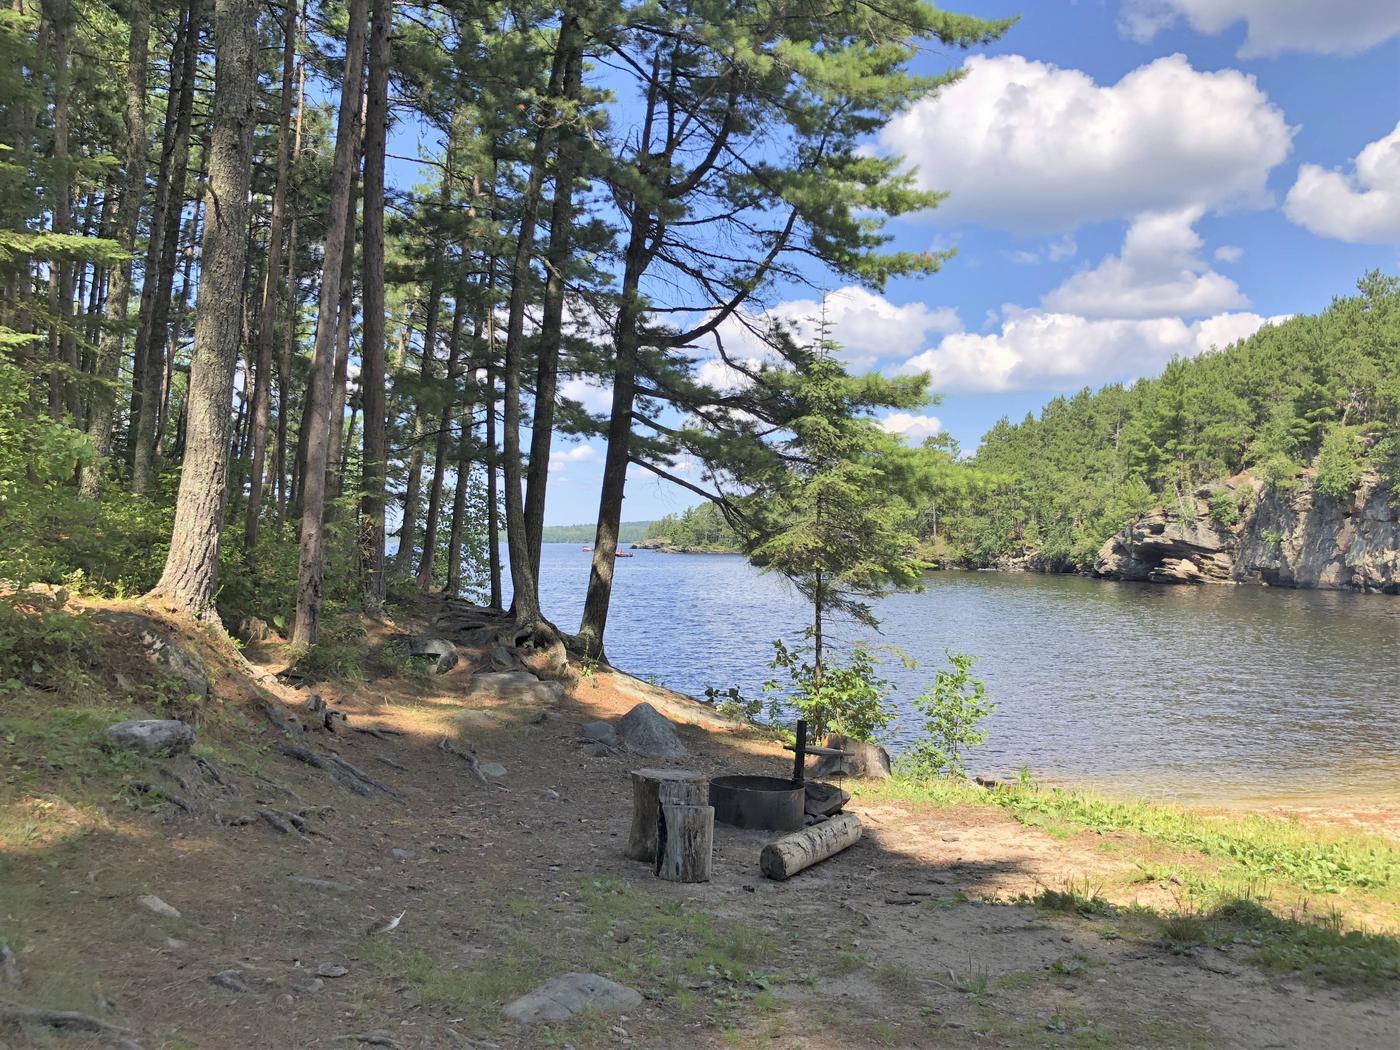 N25 - My Island WestN25 - My Island West campsite on Namakan Lake